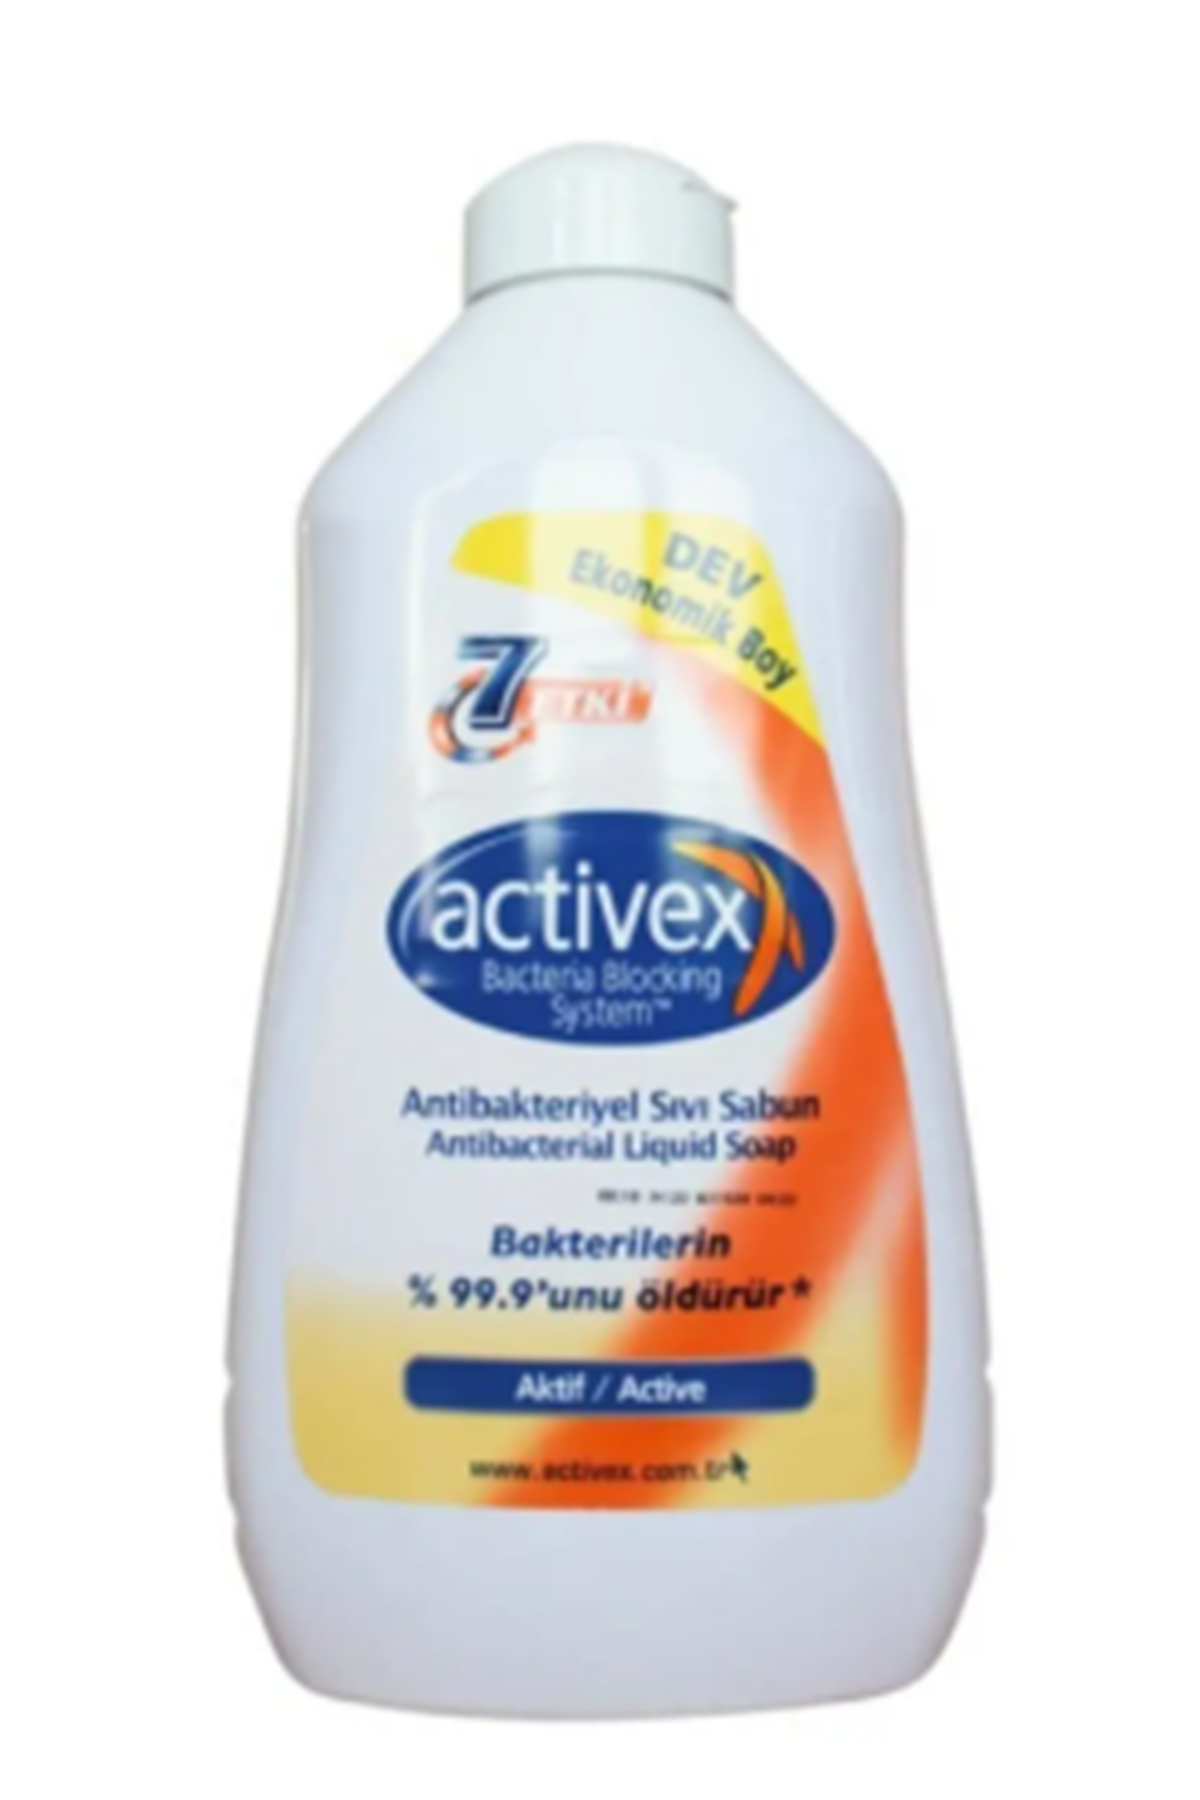 Activex Antibakteriyel Sıvı Sabun 1,8 Litre Aktif